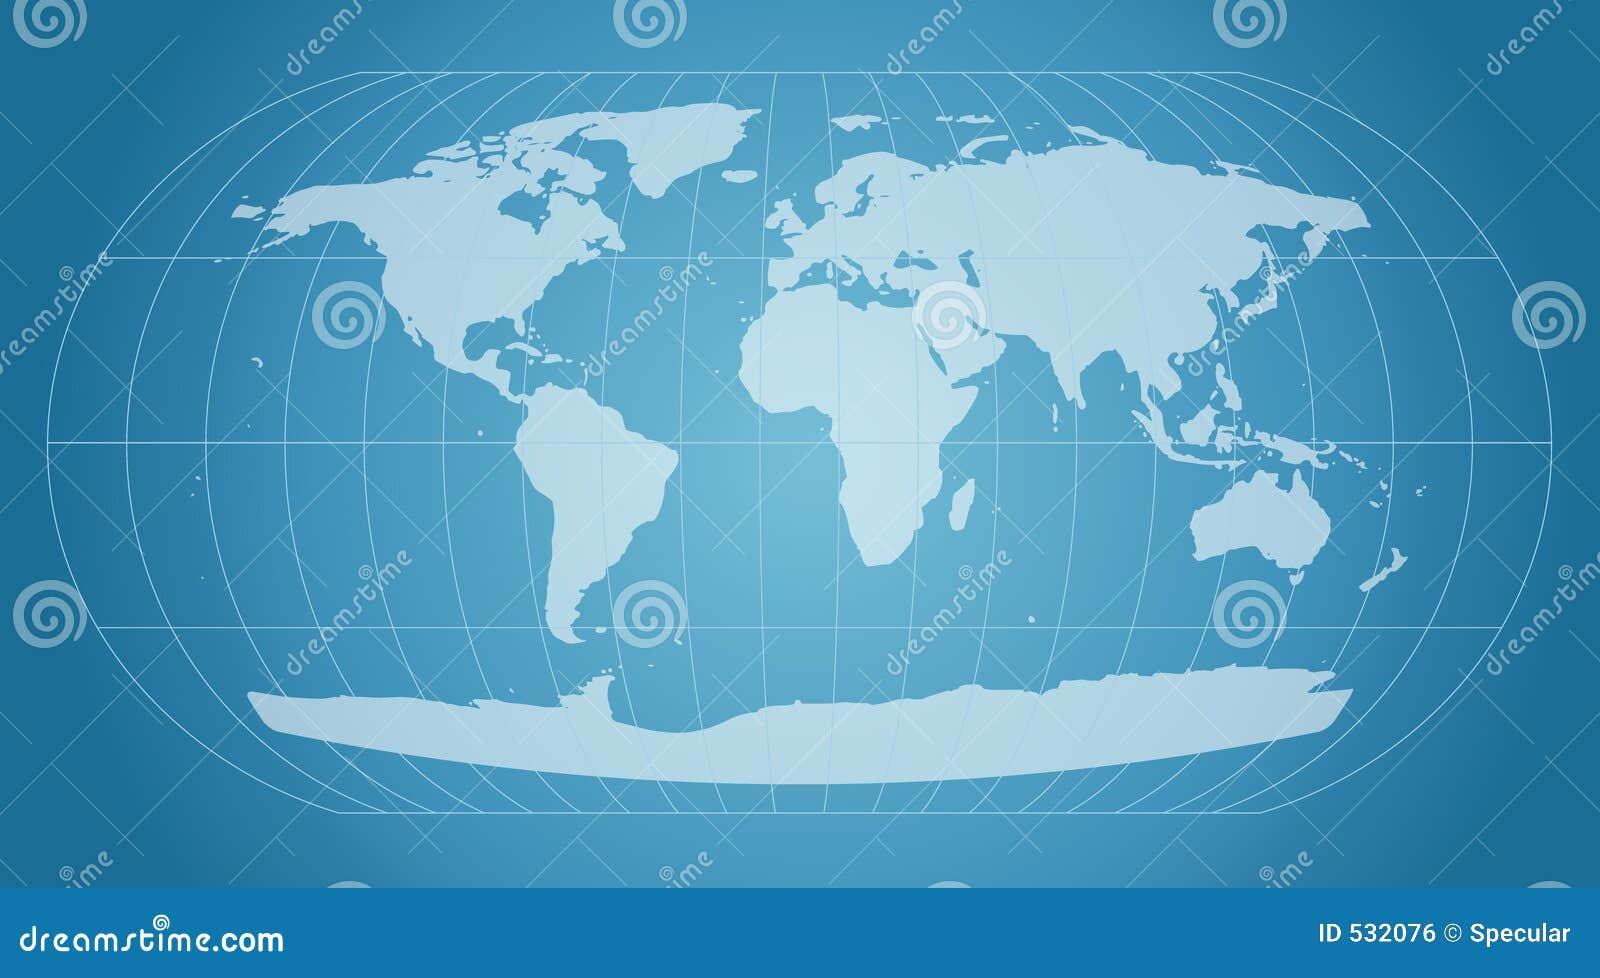 Mapa de mundo azul